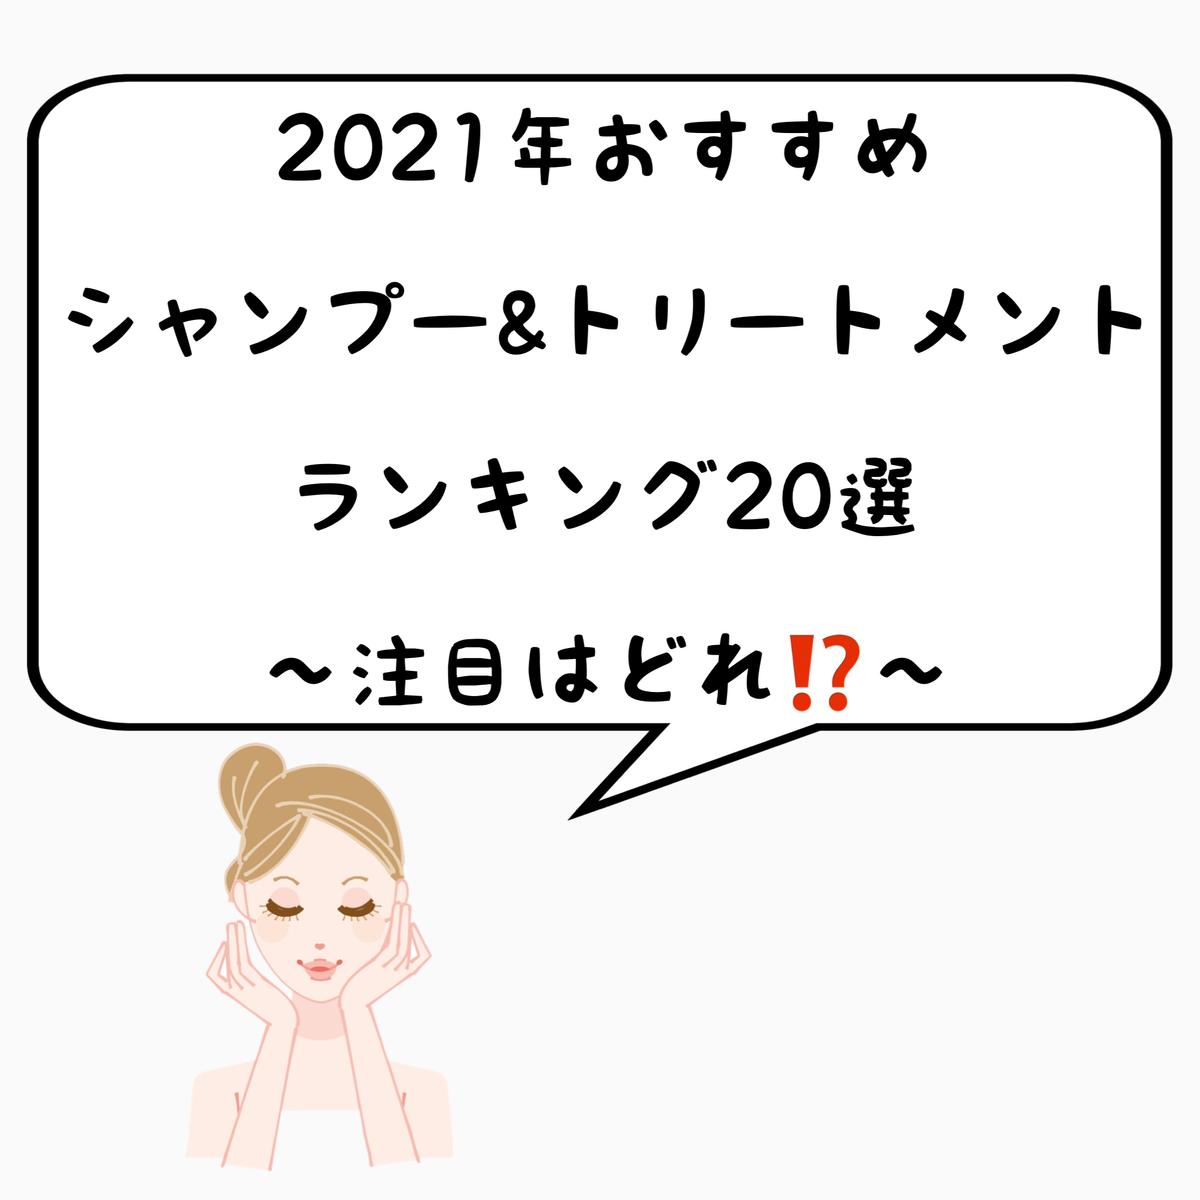 f:id:nokonoko_o:20210120110706j:plain